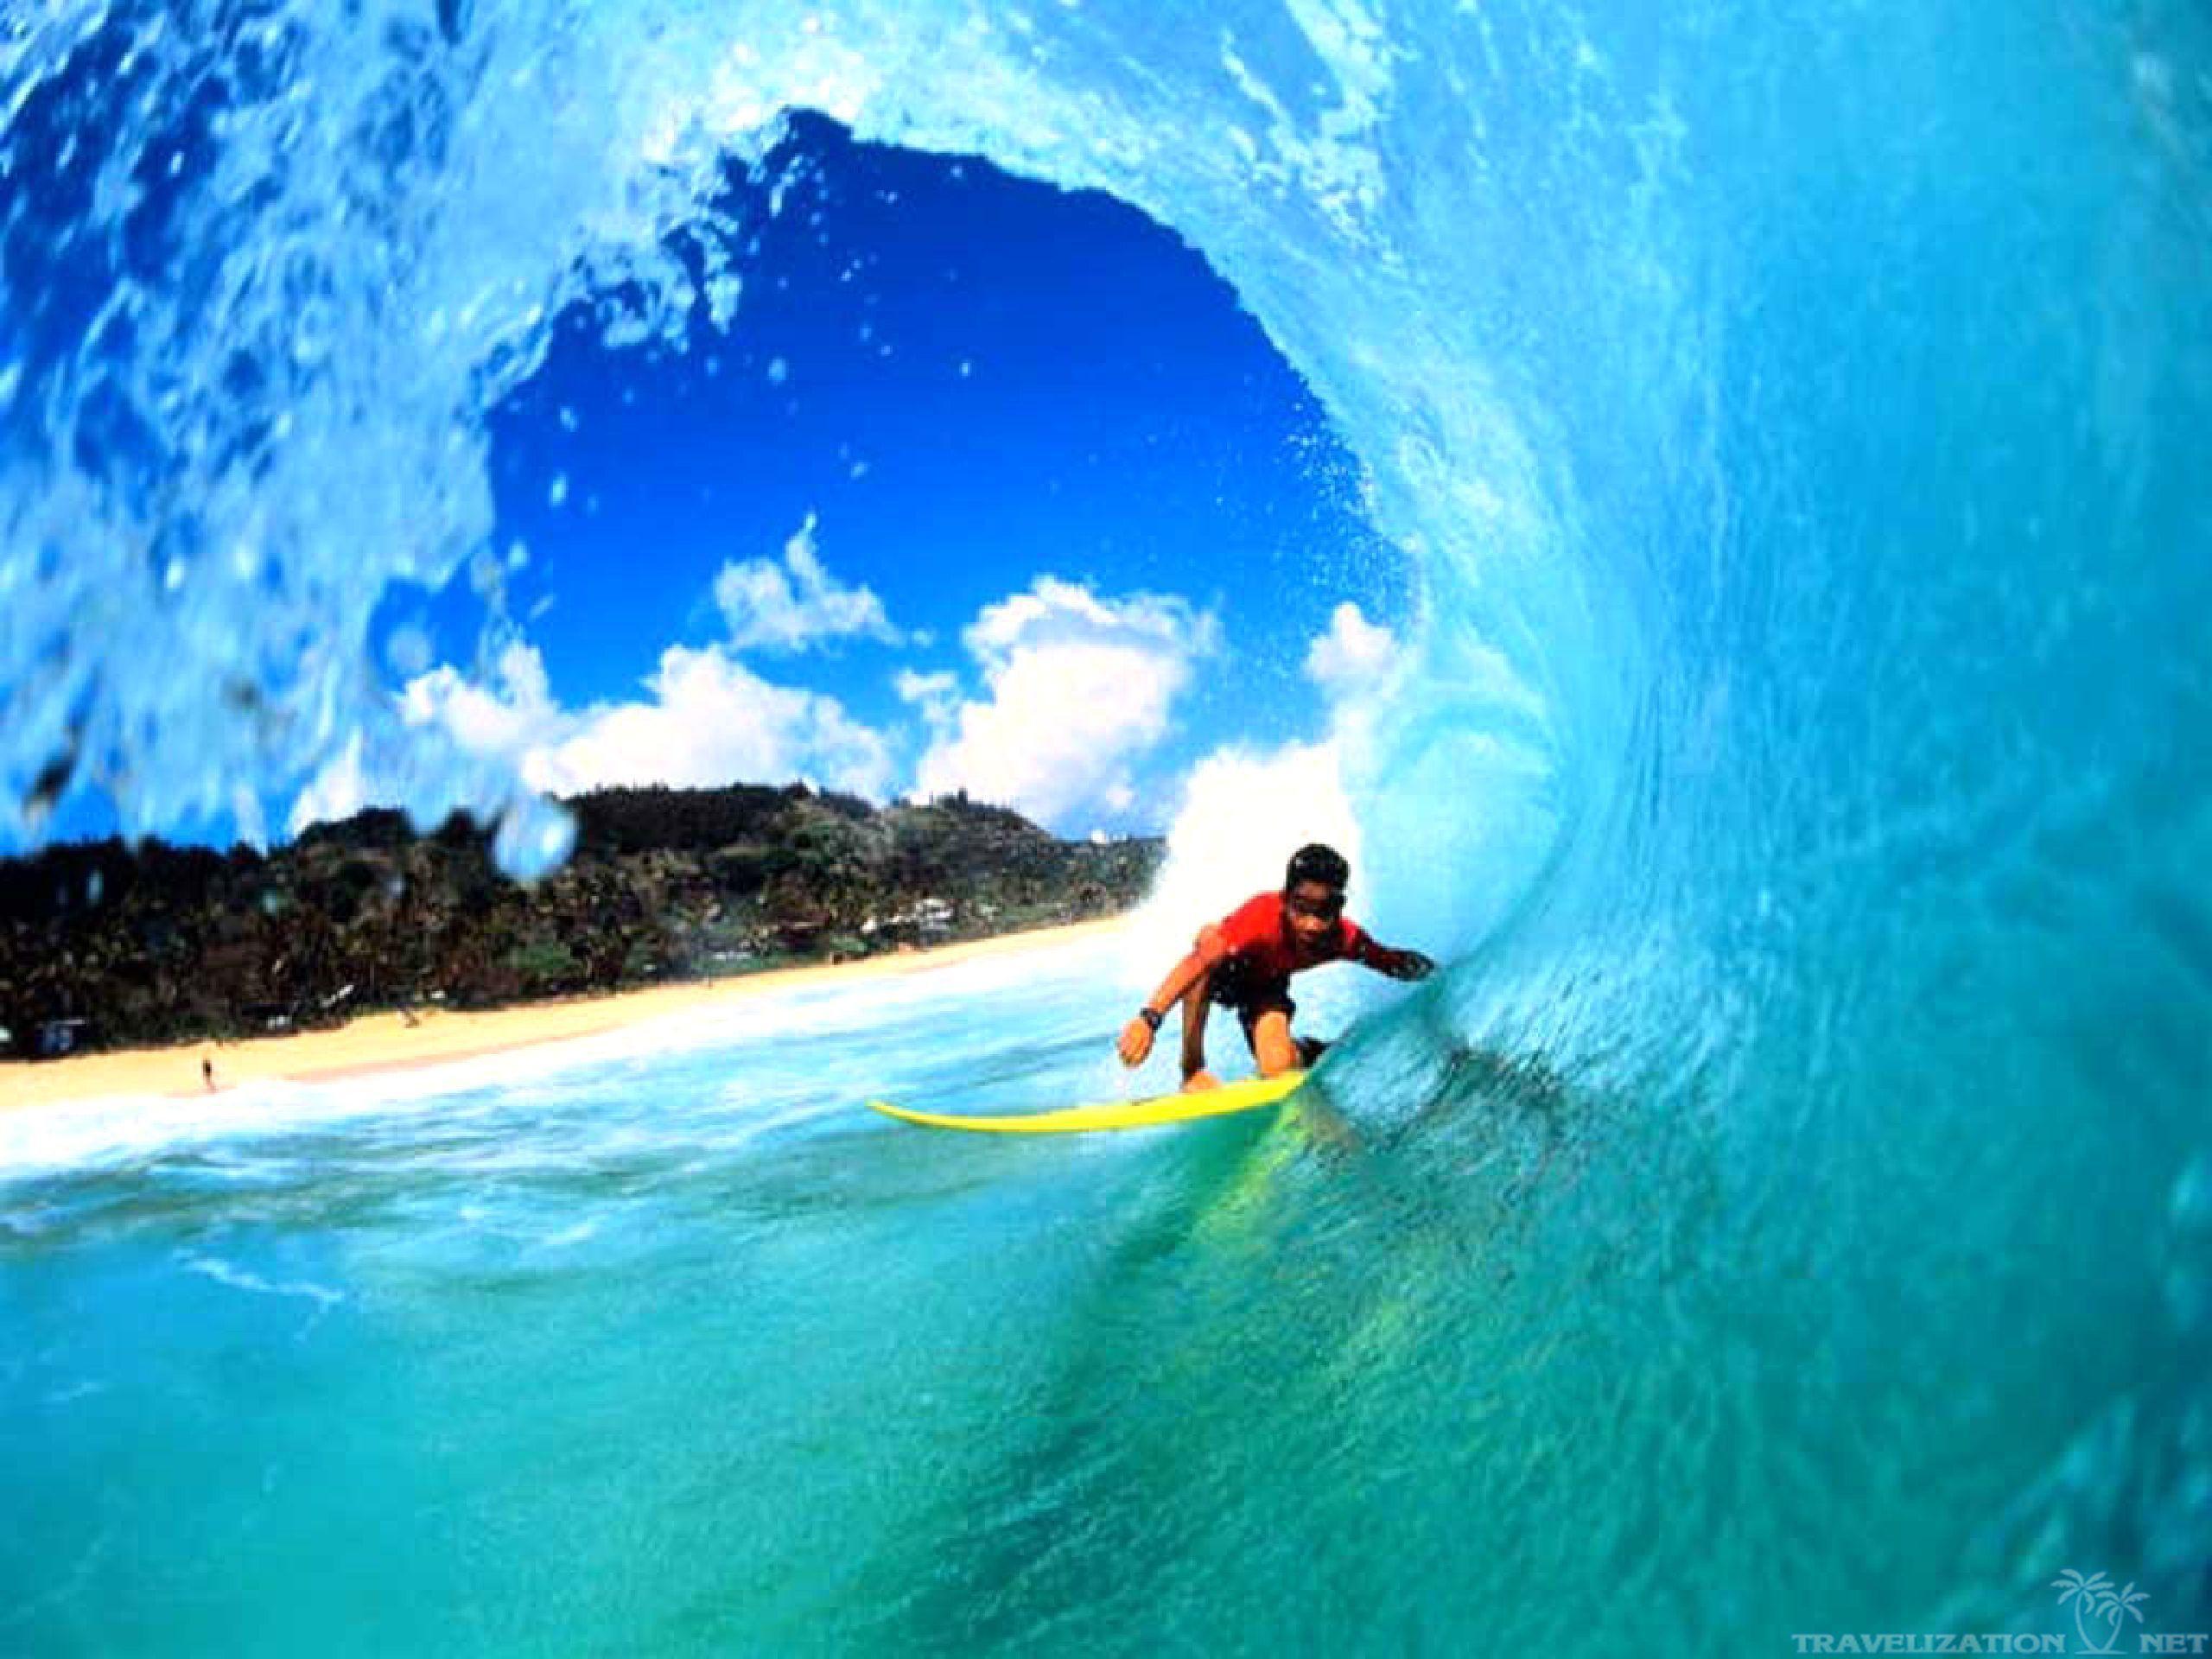 Surfer Girl Bali Wallpaper Surfing Desktop Backgrounds Wallpaper Cave